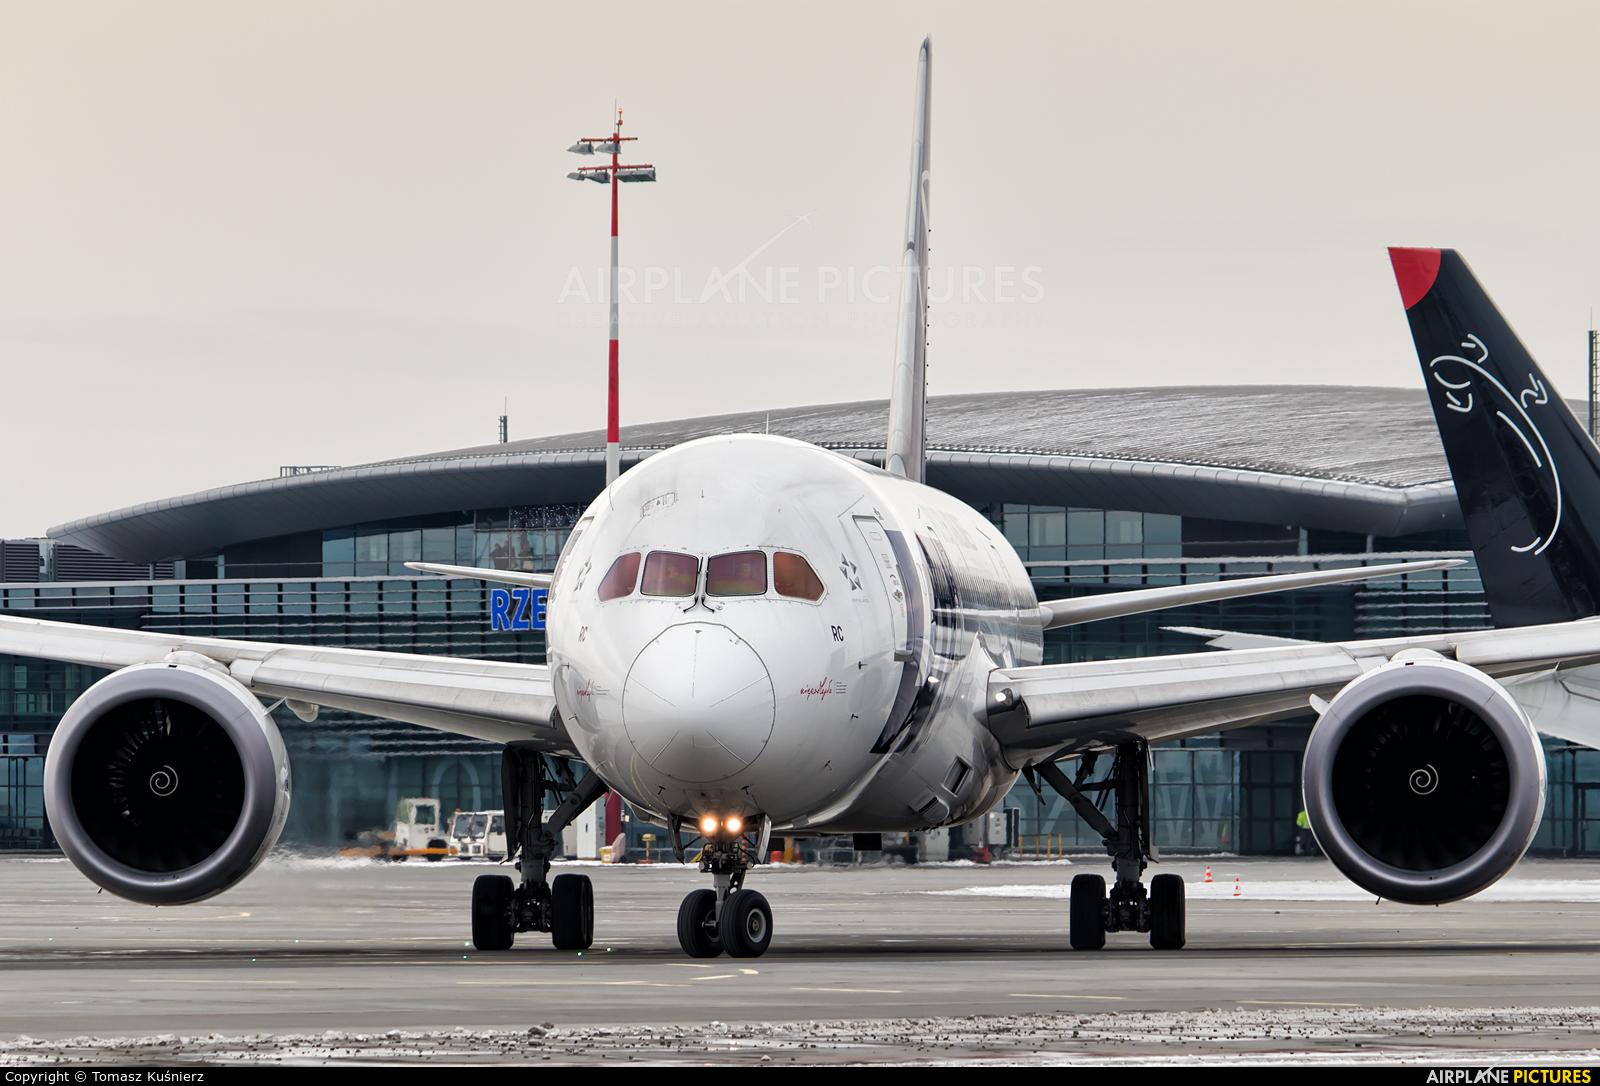 LOT - Polish Airlines SP-LRC aircraft at Rzeszów-Jasionka